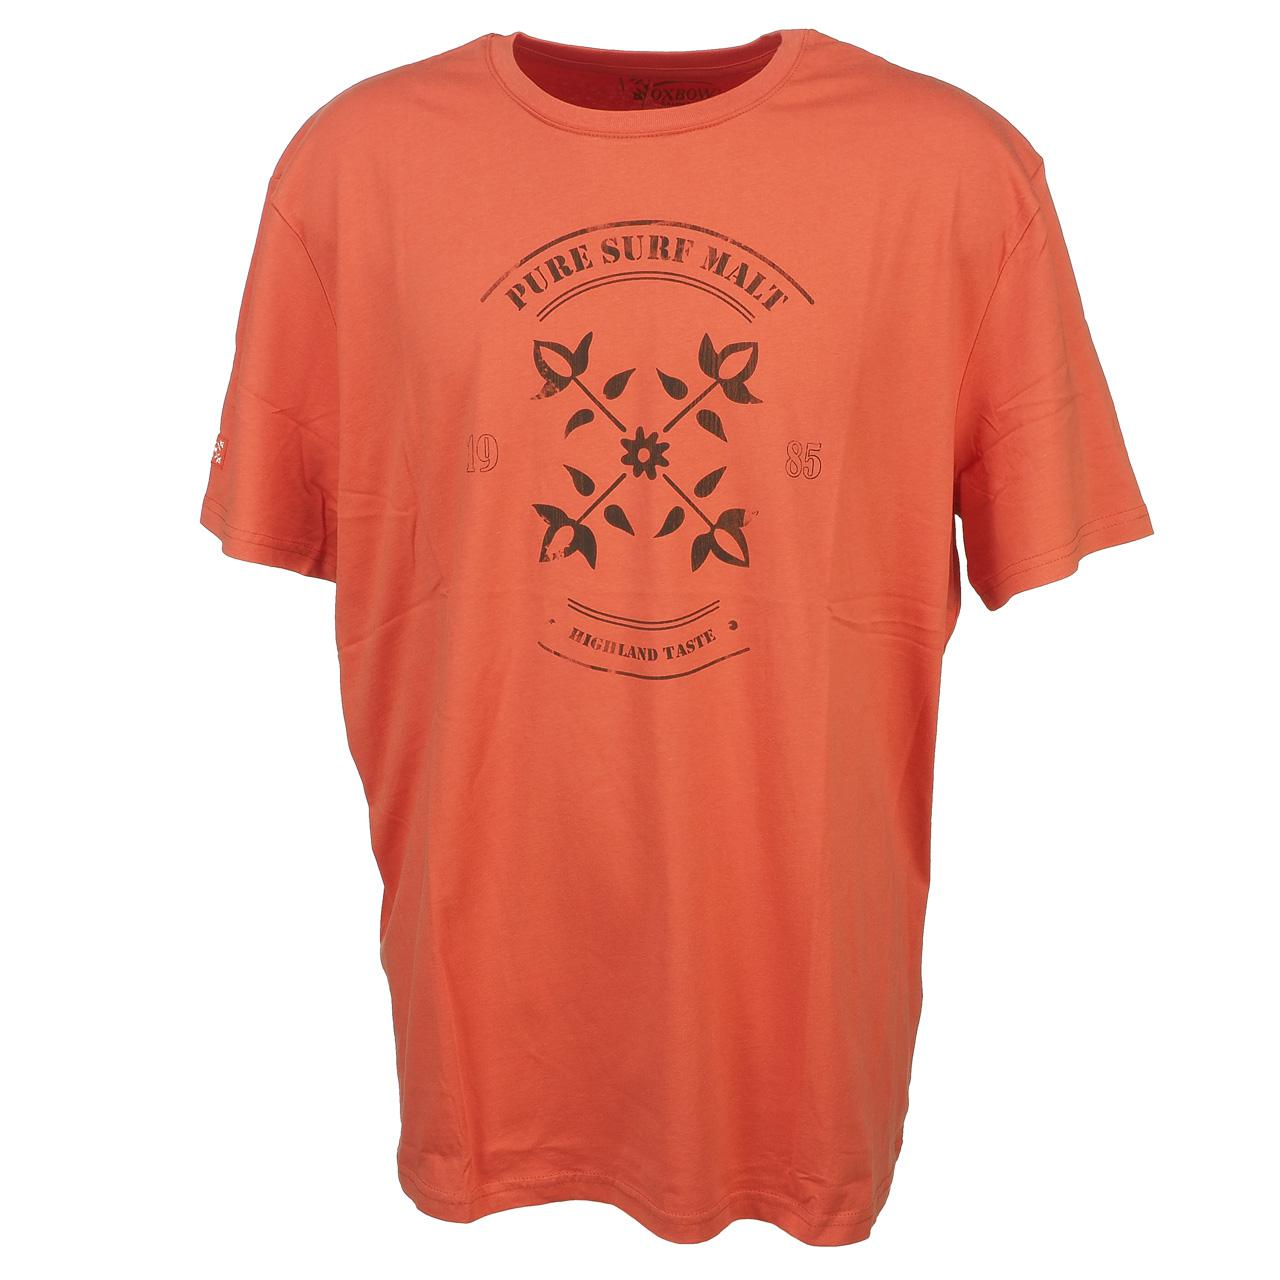 Short-Sleeve-T-Shirt-Oxbow-Taynur-Terra-Oxbow-Pink-47165-New